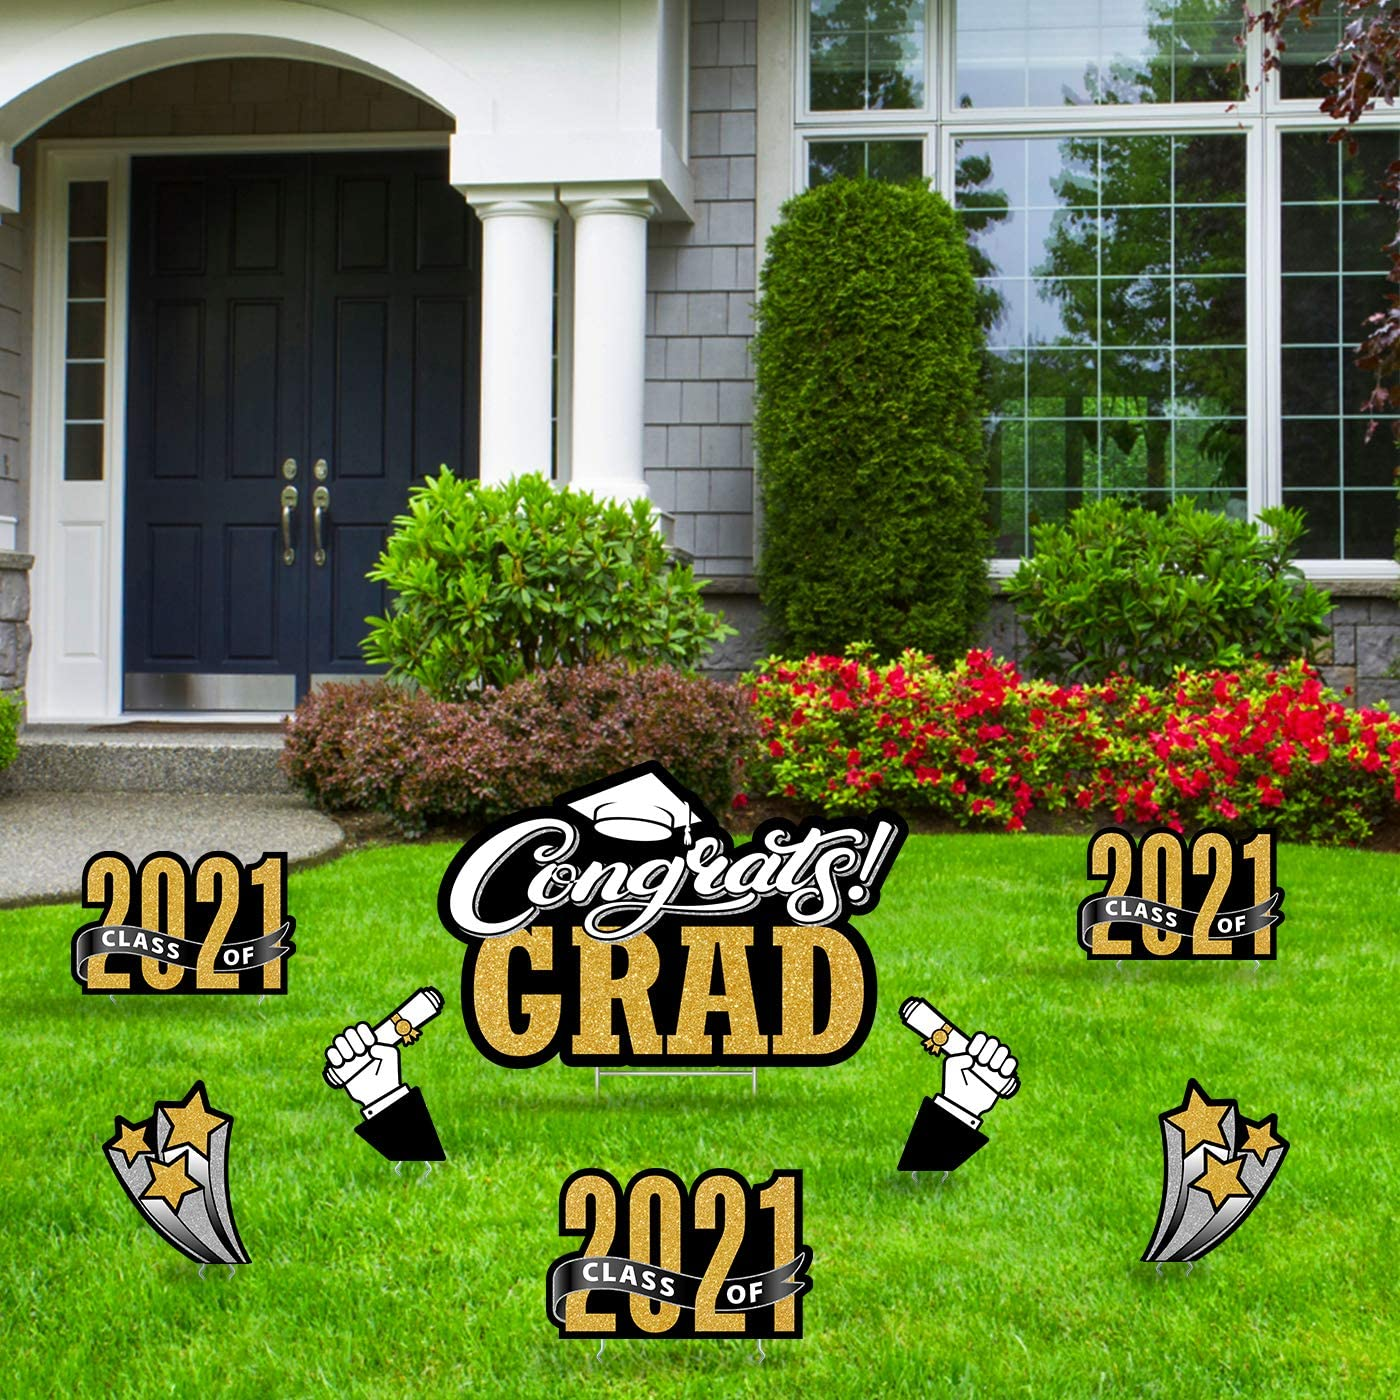 Coroplast Congrats Grad 2021 with Grad Cap Weather Resistant Yard Sign